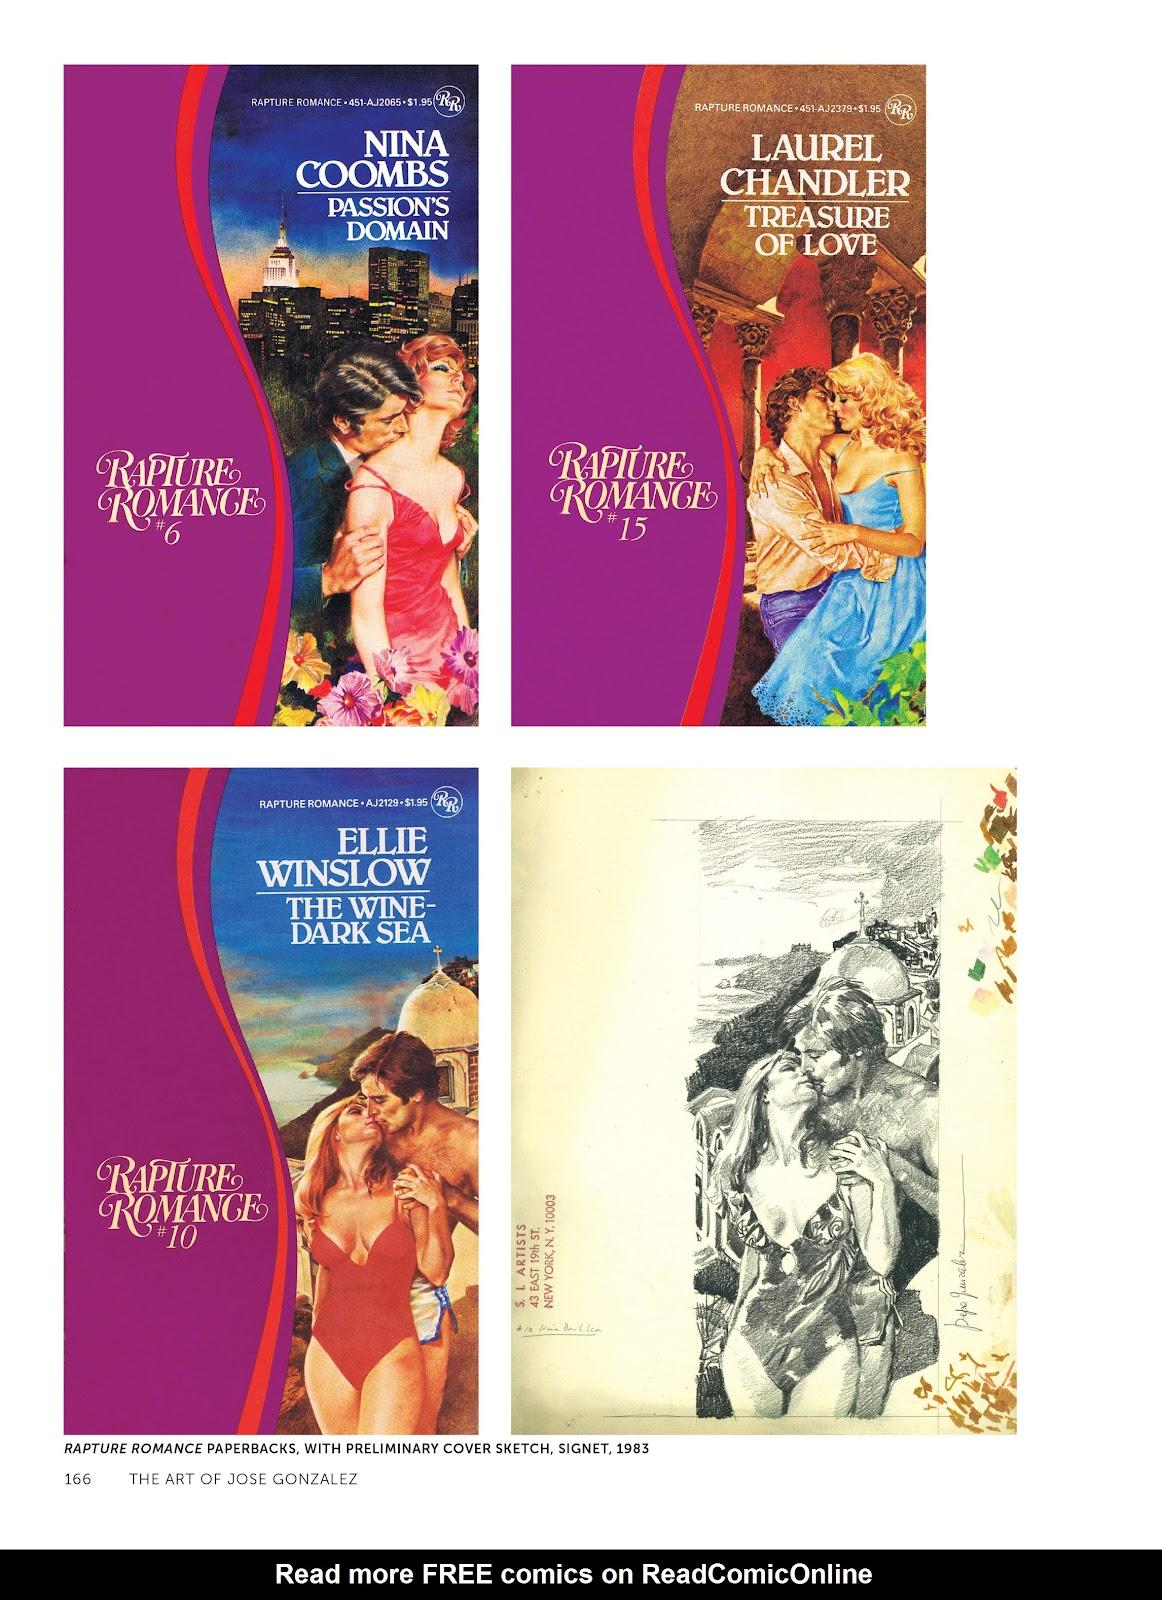 Read online The Art of Jose Gonzalez comic -  Issue # TPB (Part 2) - 68